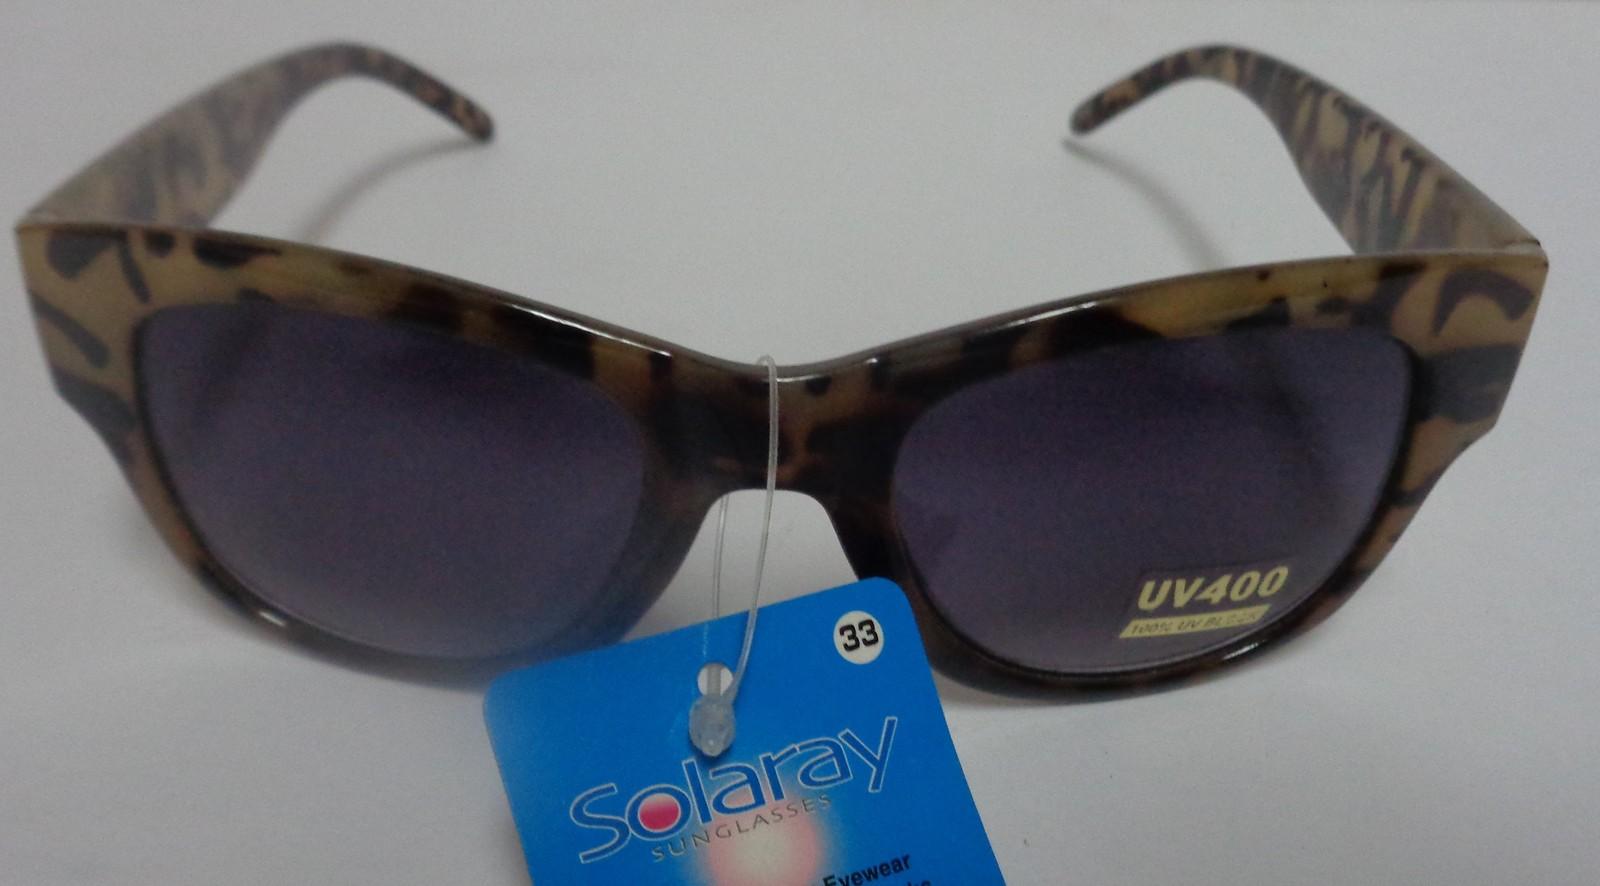 e6d2736d5e Solaray Camouflage Sunglasses NWT Animal and 49 similar items